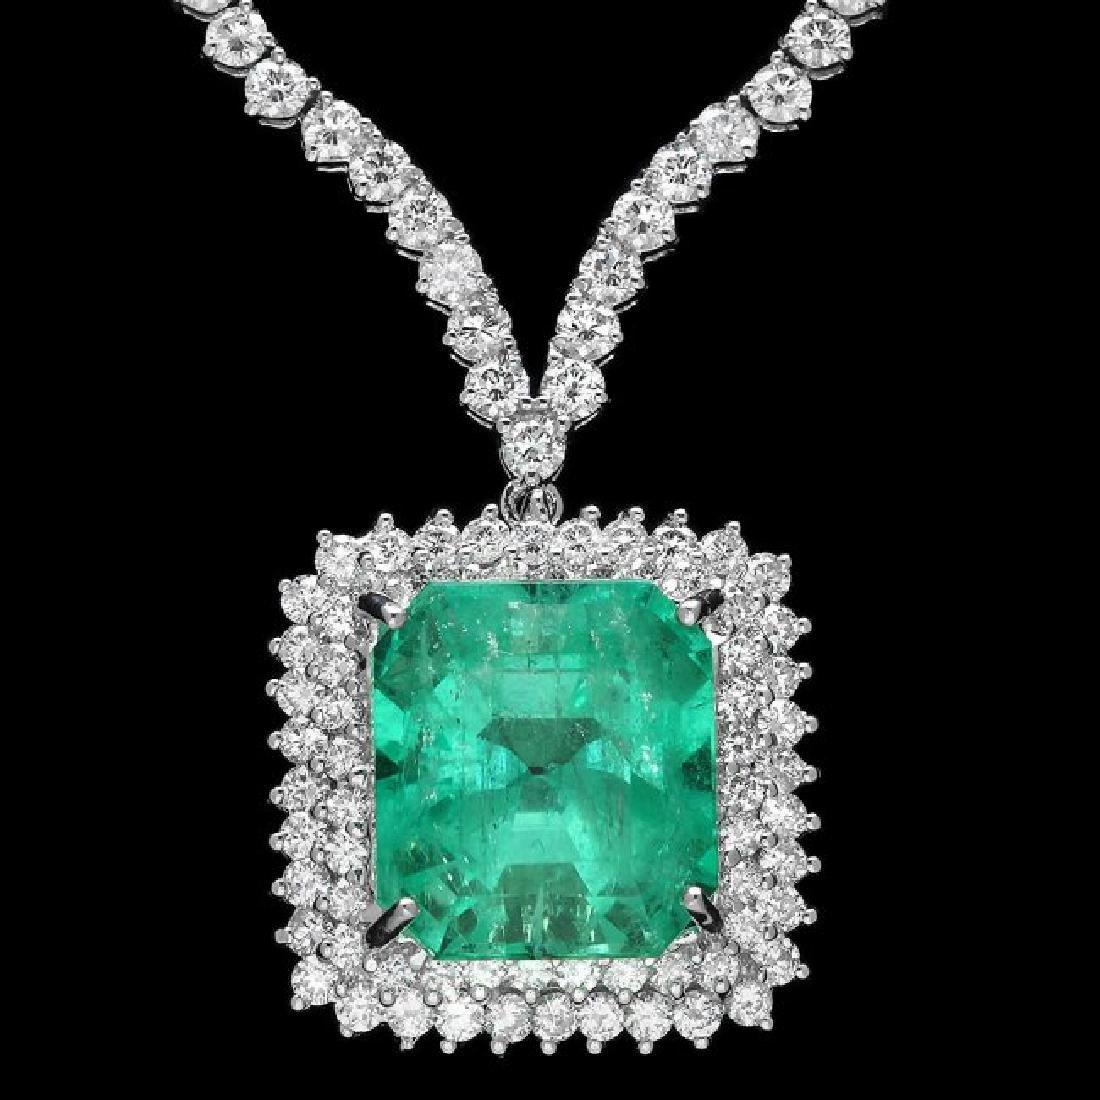 18k Gold 17.00ct Emerald 10.70ct Diamond Necklace